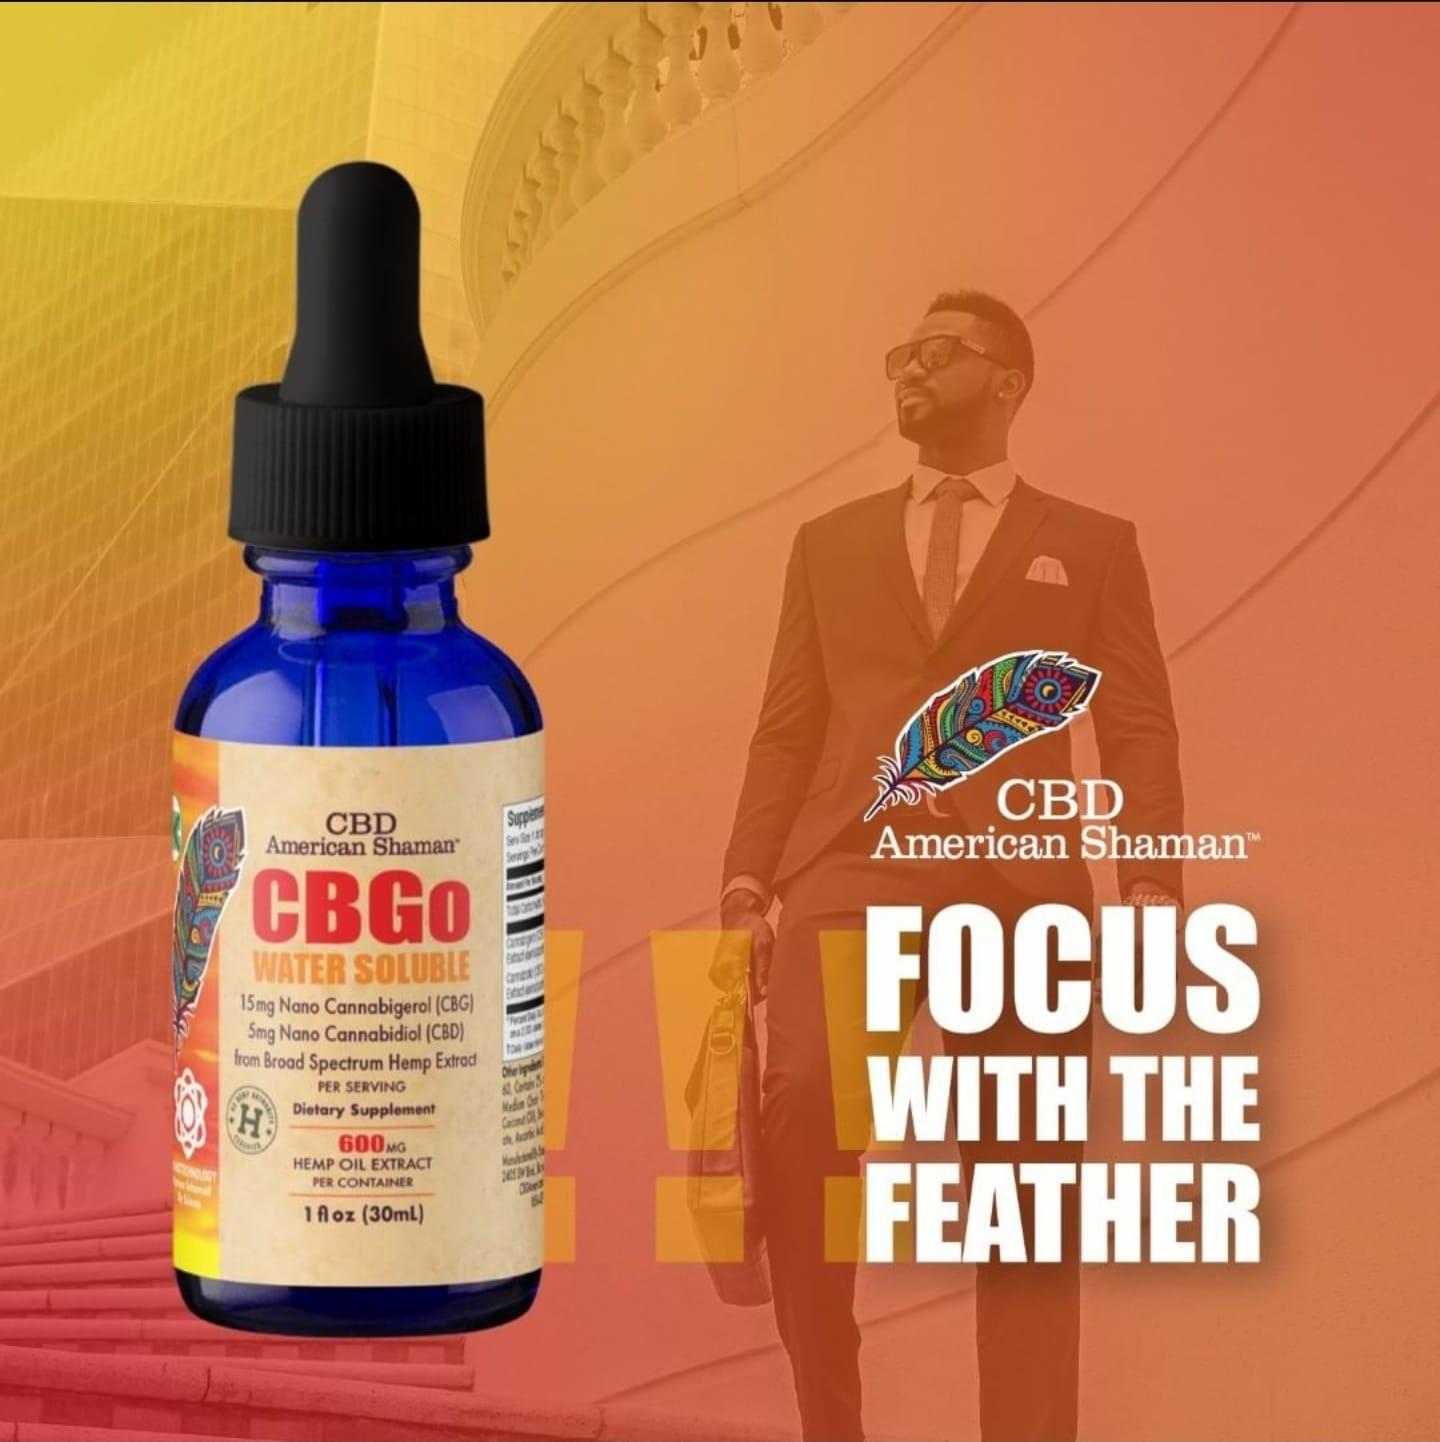 cbgo-focus-with-the-feather.jpg